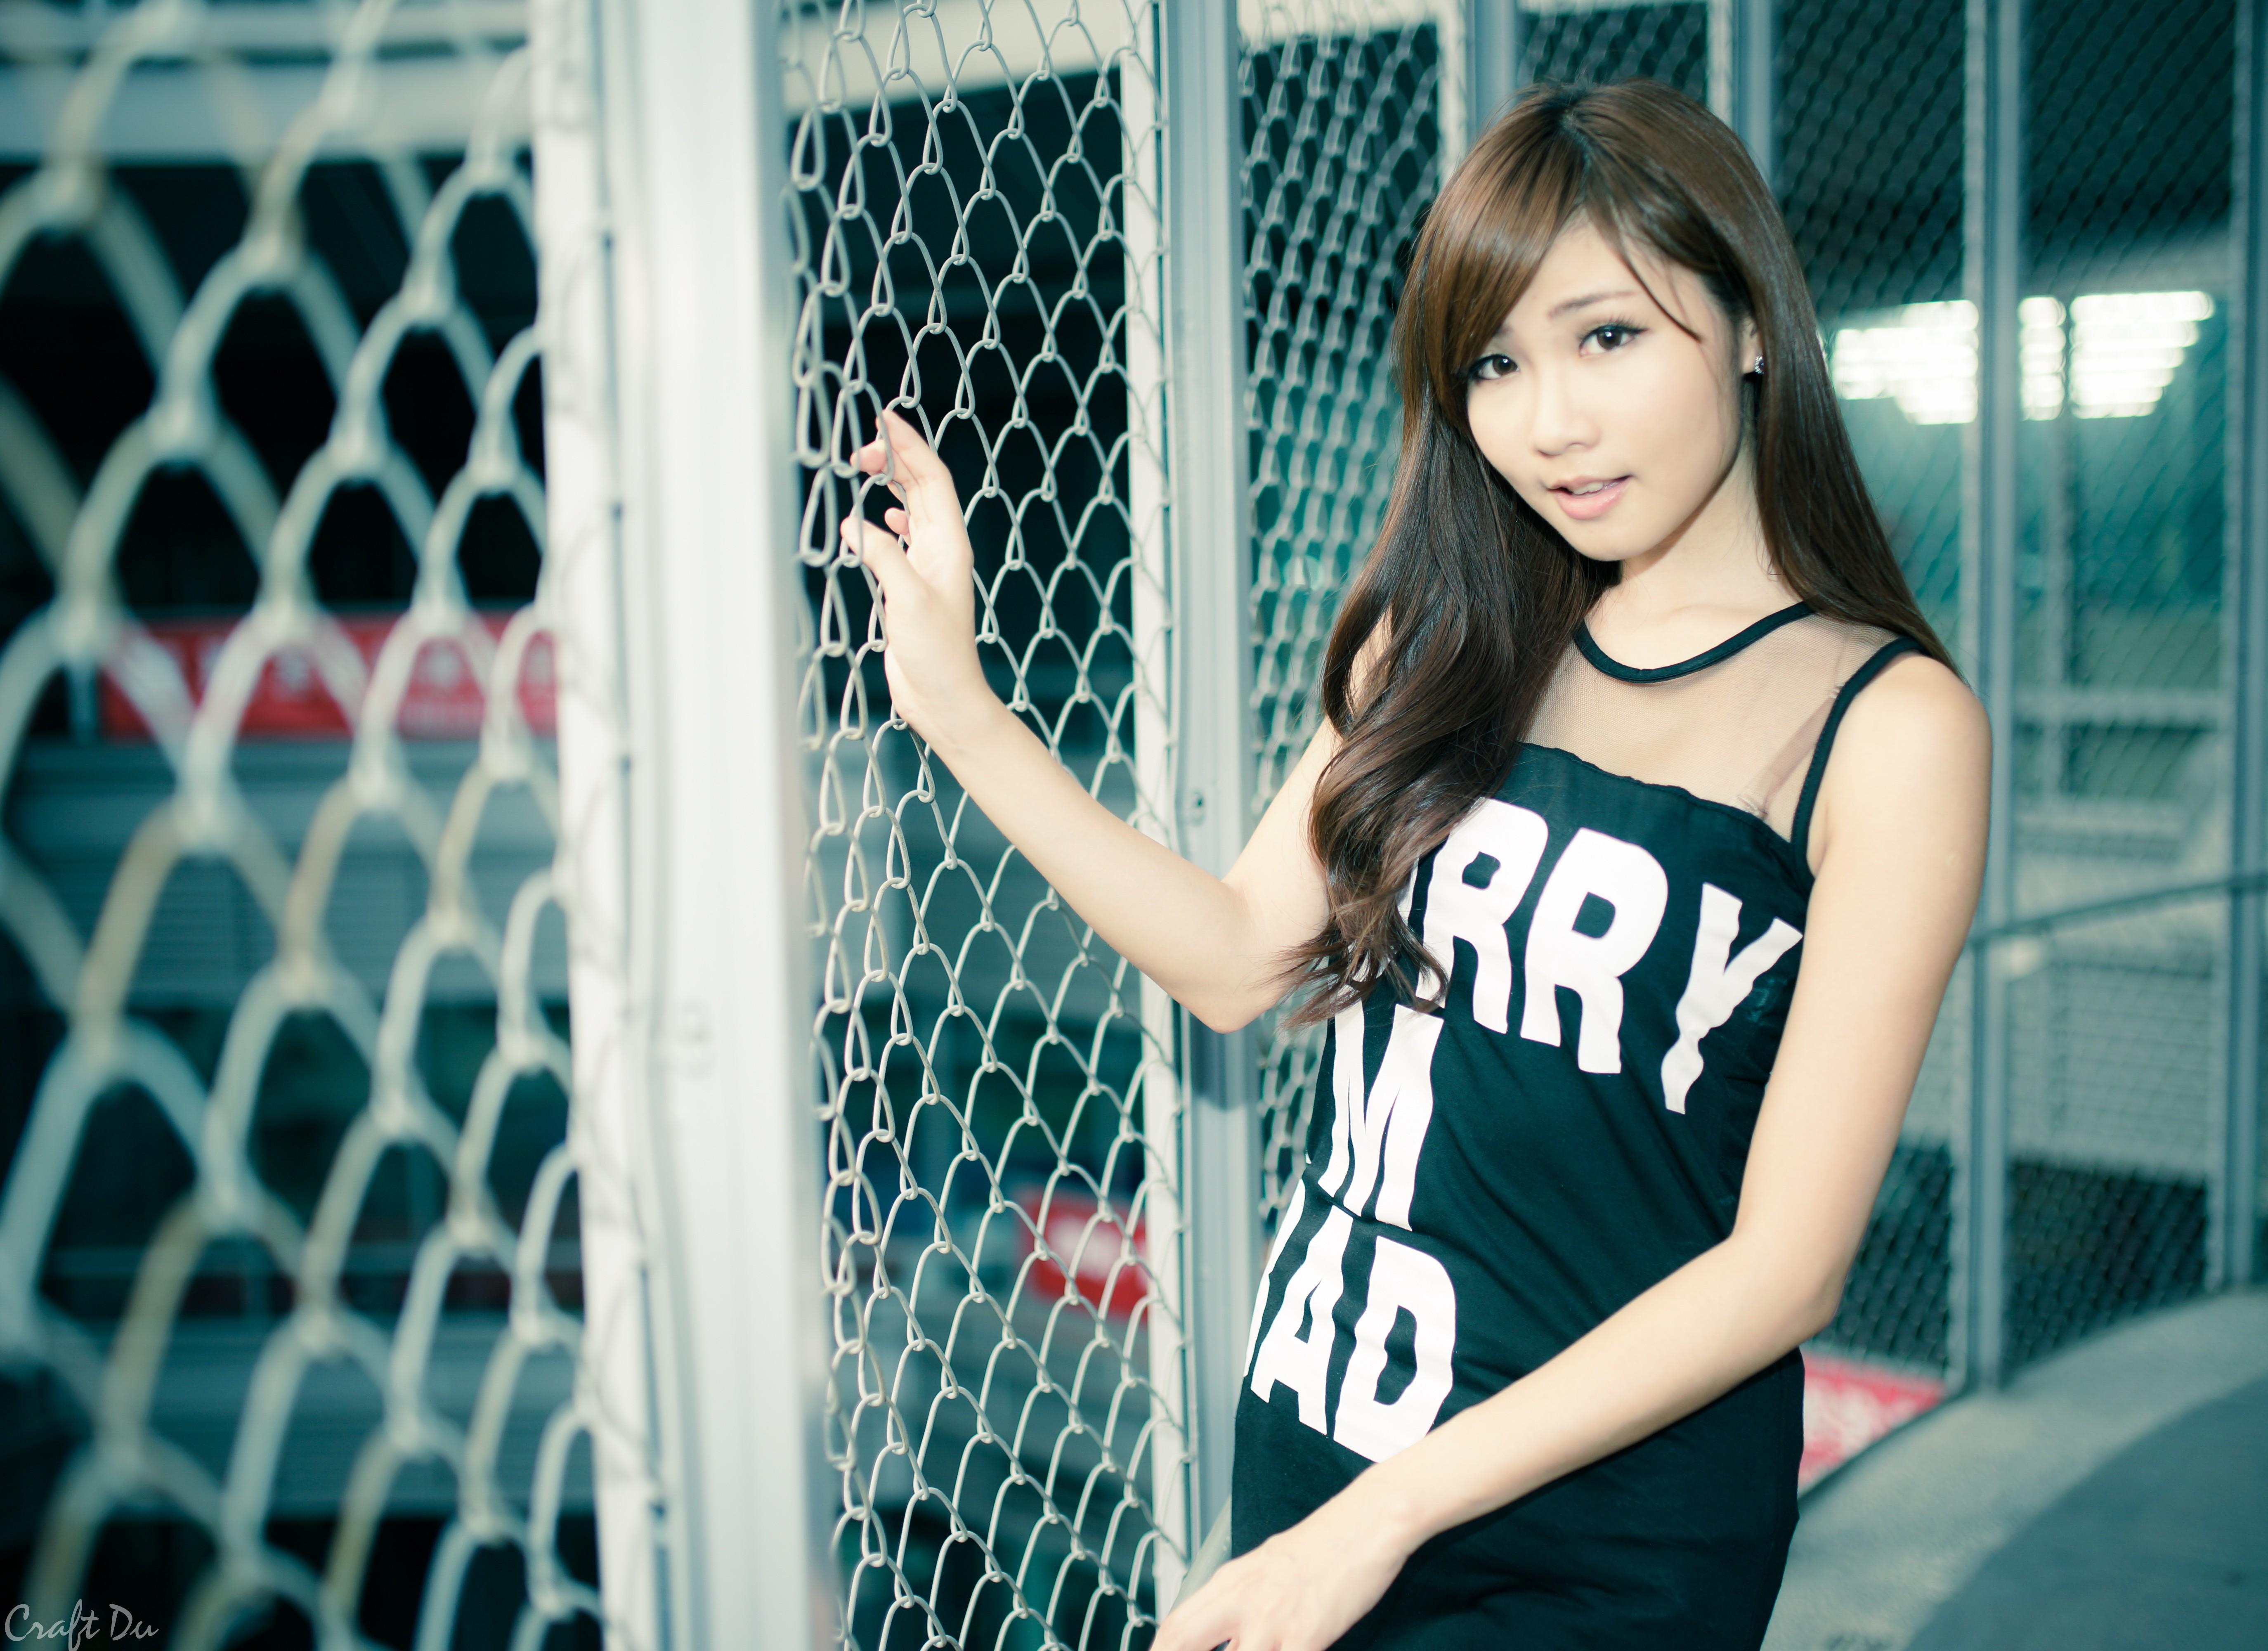 People 5496x4000 brunette brown eyes long hair black dress Zhang Ya Zhu